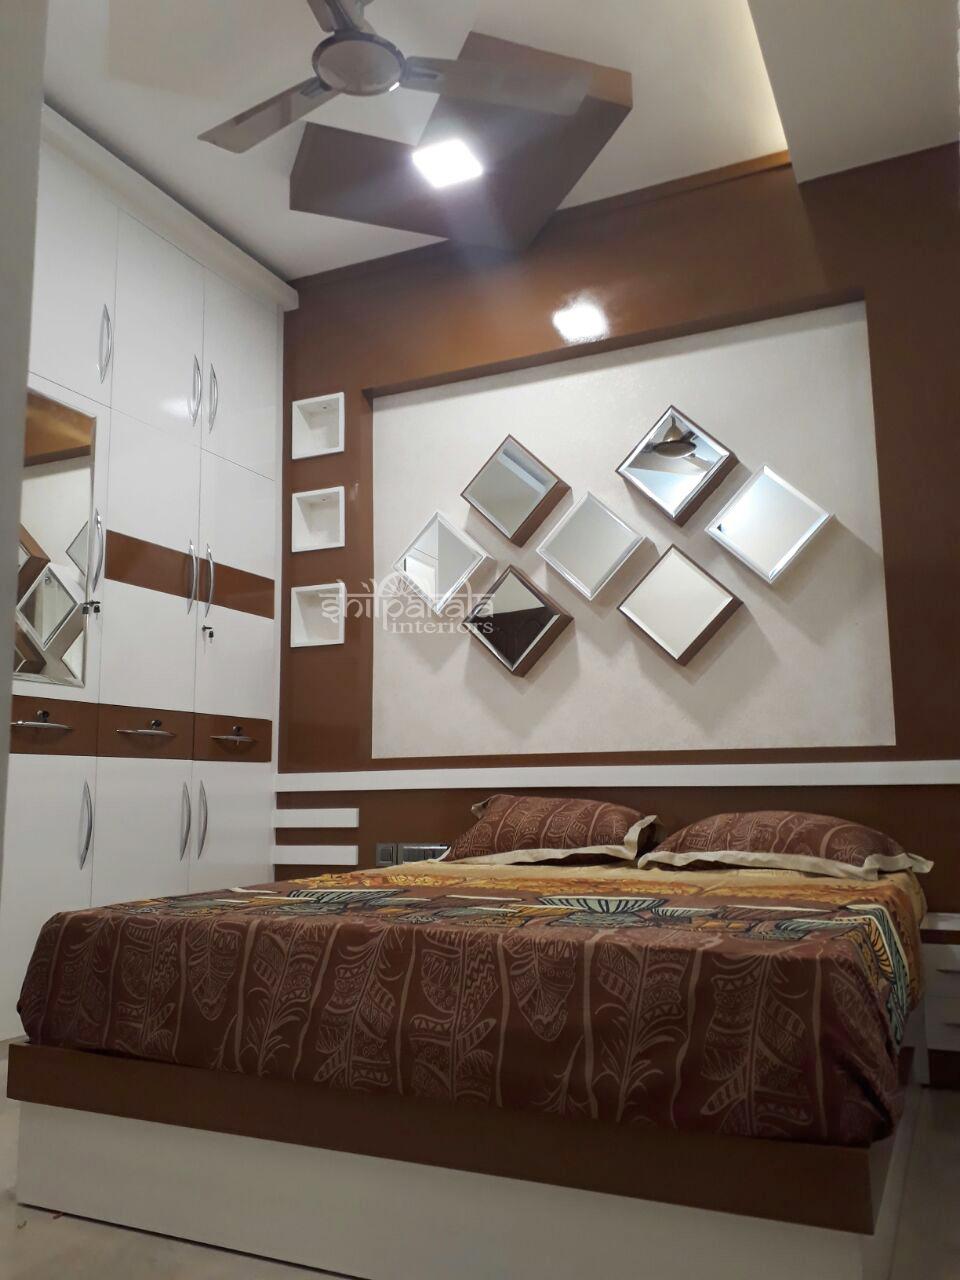 Kerala House Interior Design: Kerala Home Interior Design Images Gallery